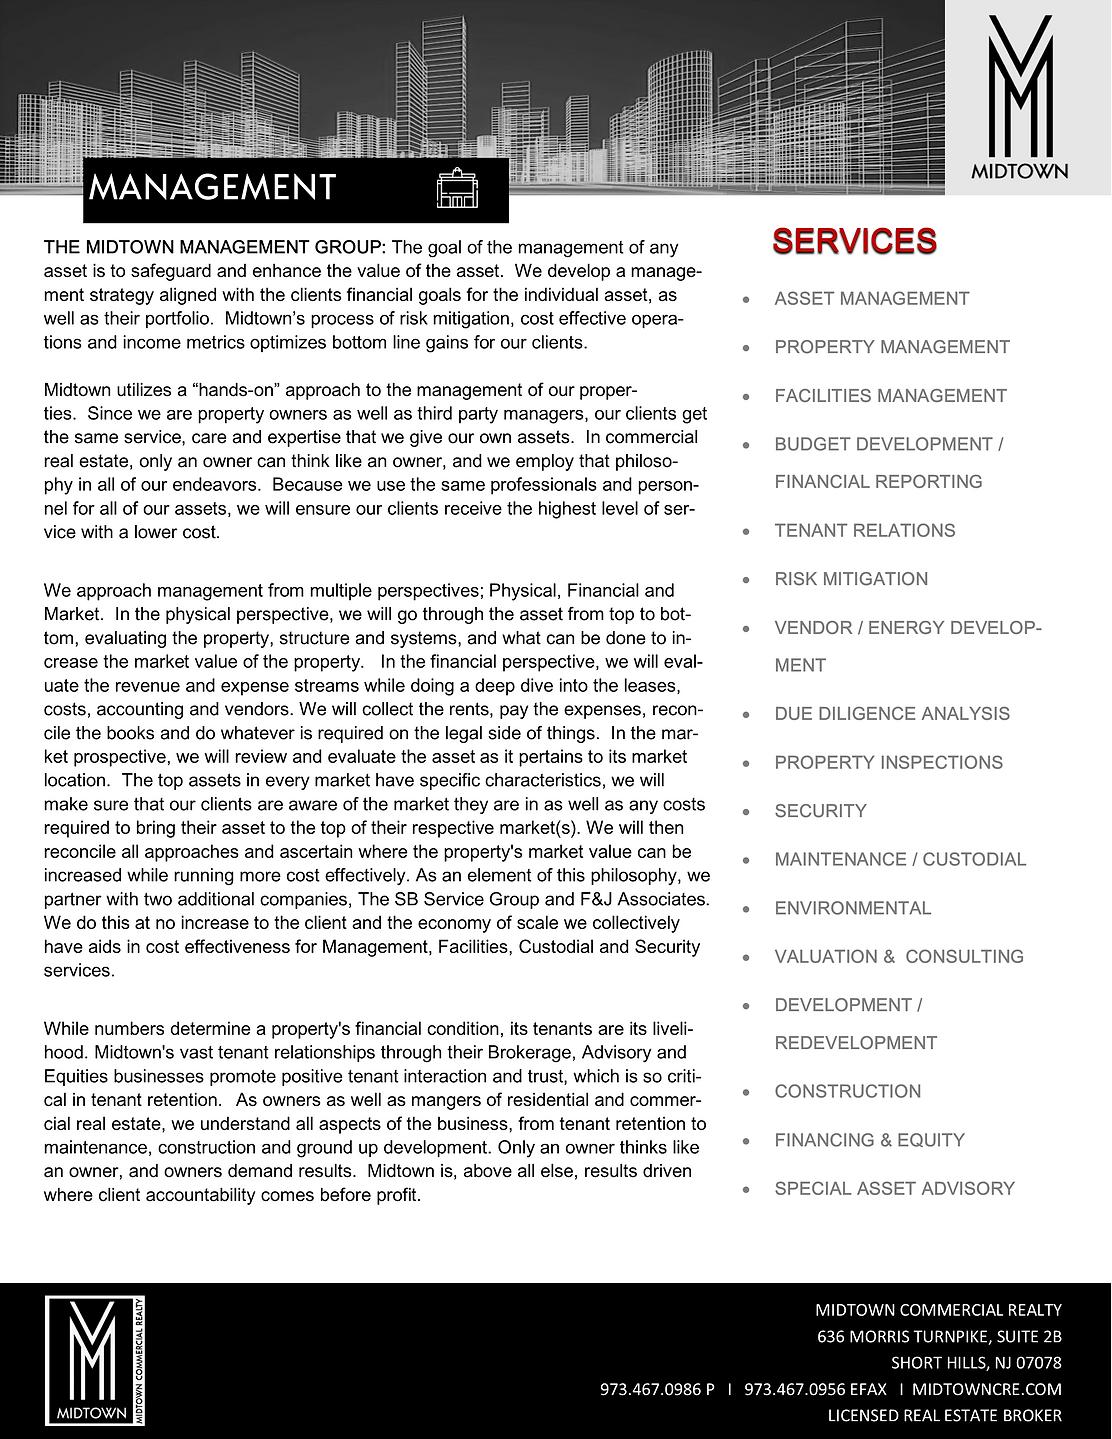 MIDTOWN MANAGEMENT 1.2021.png